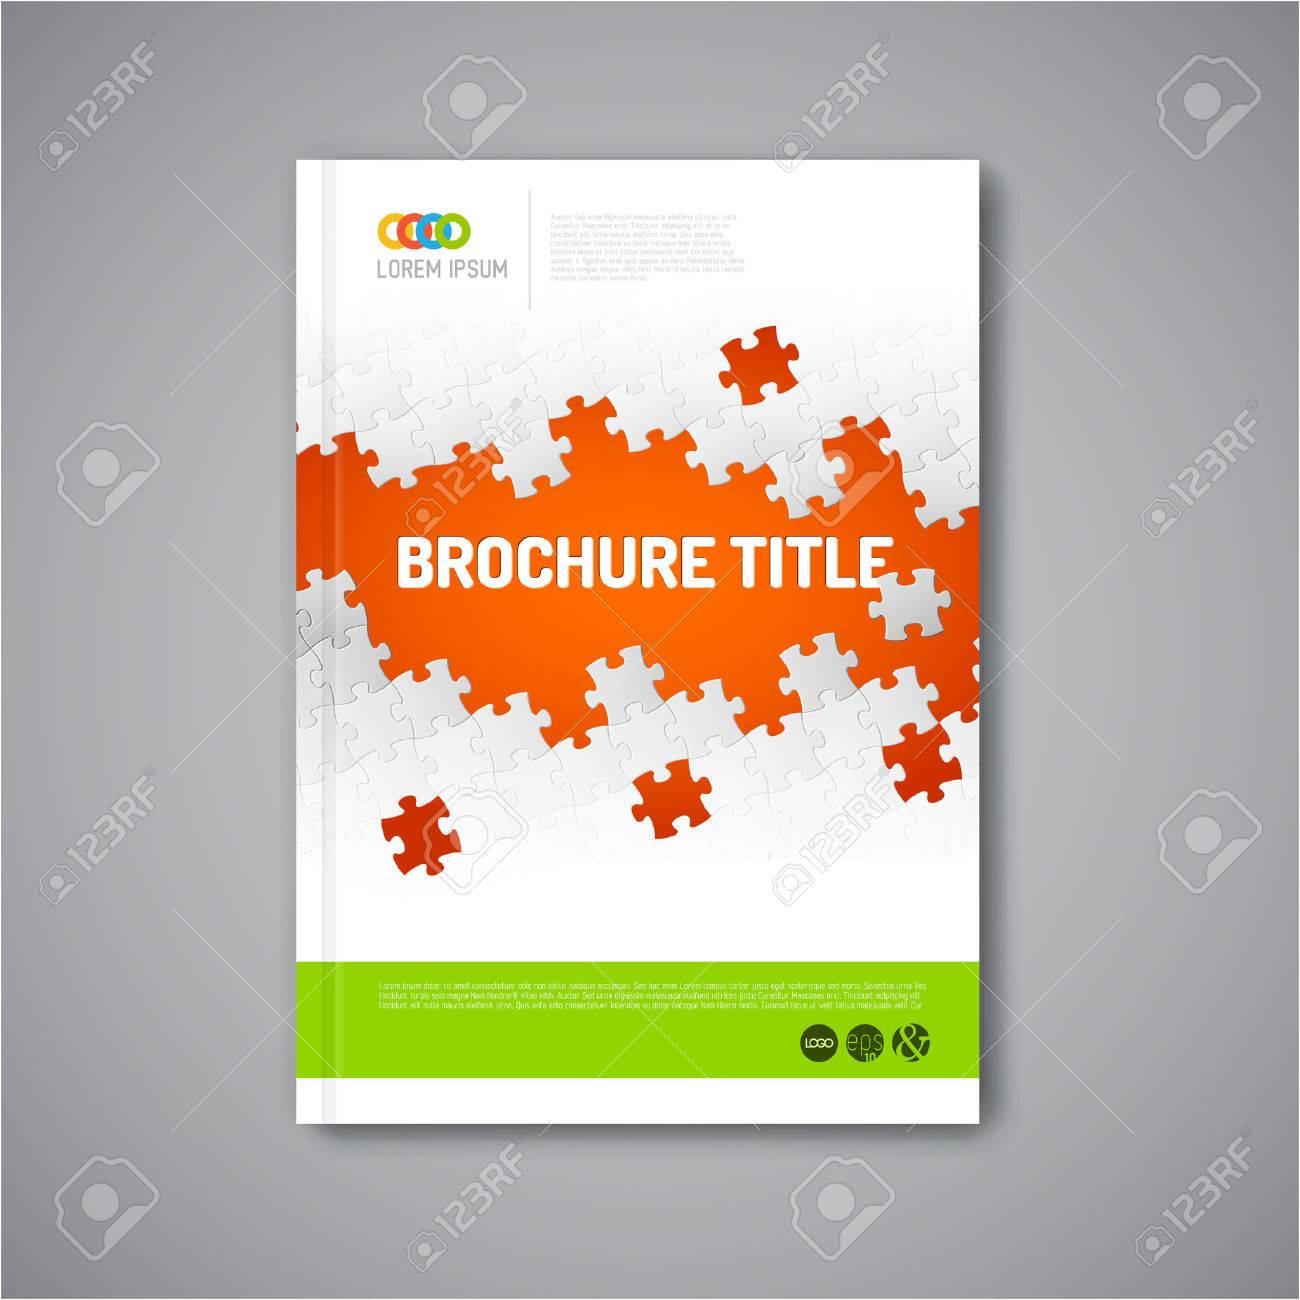 modern vector abstract brochure report or flyer design template